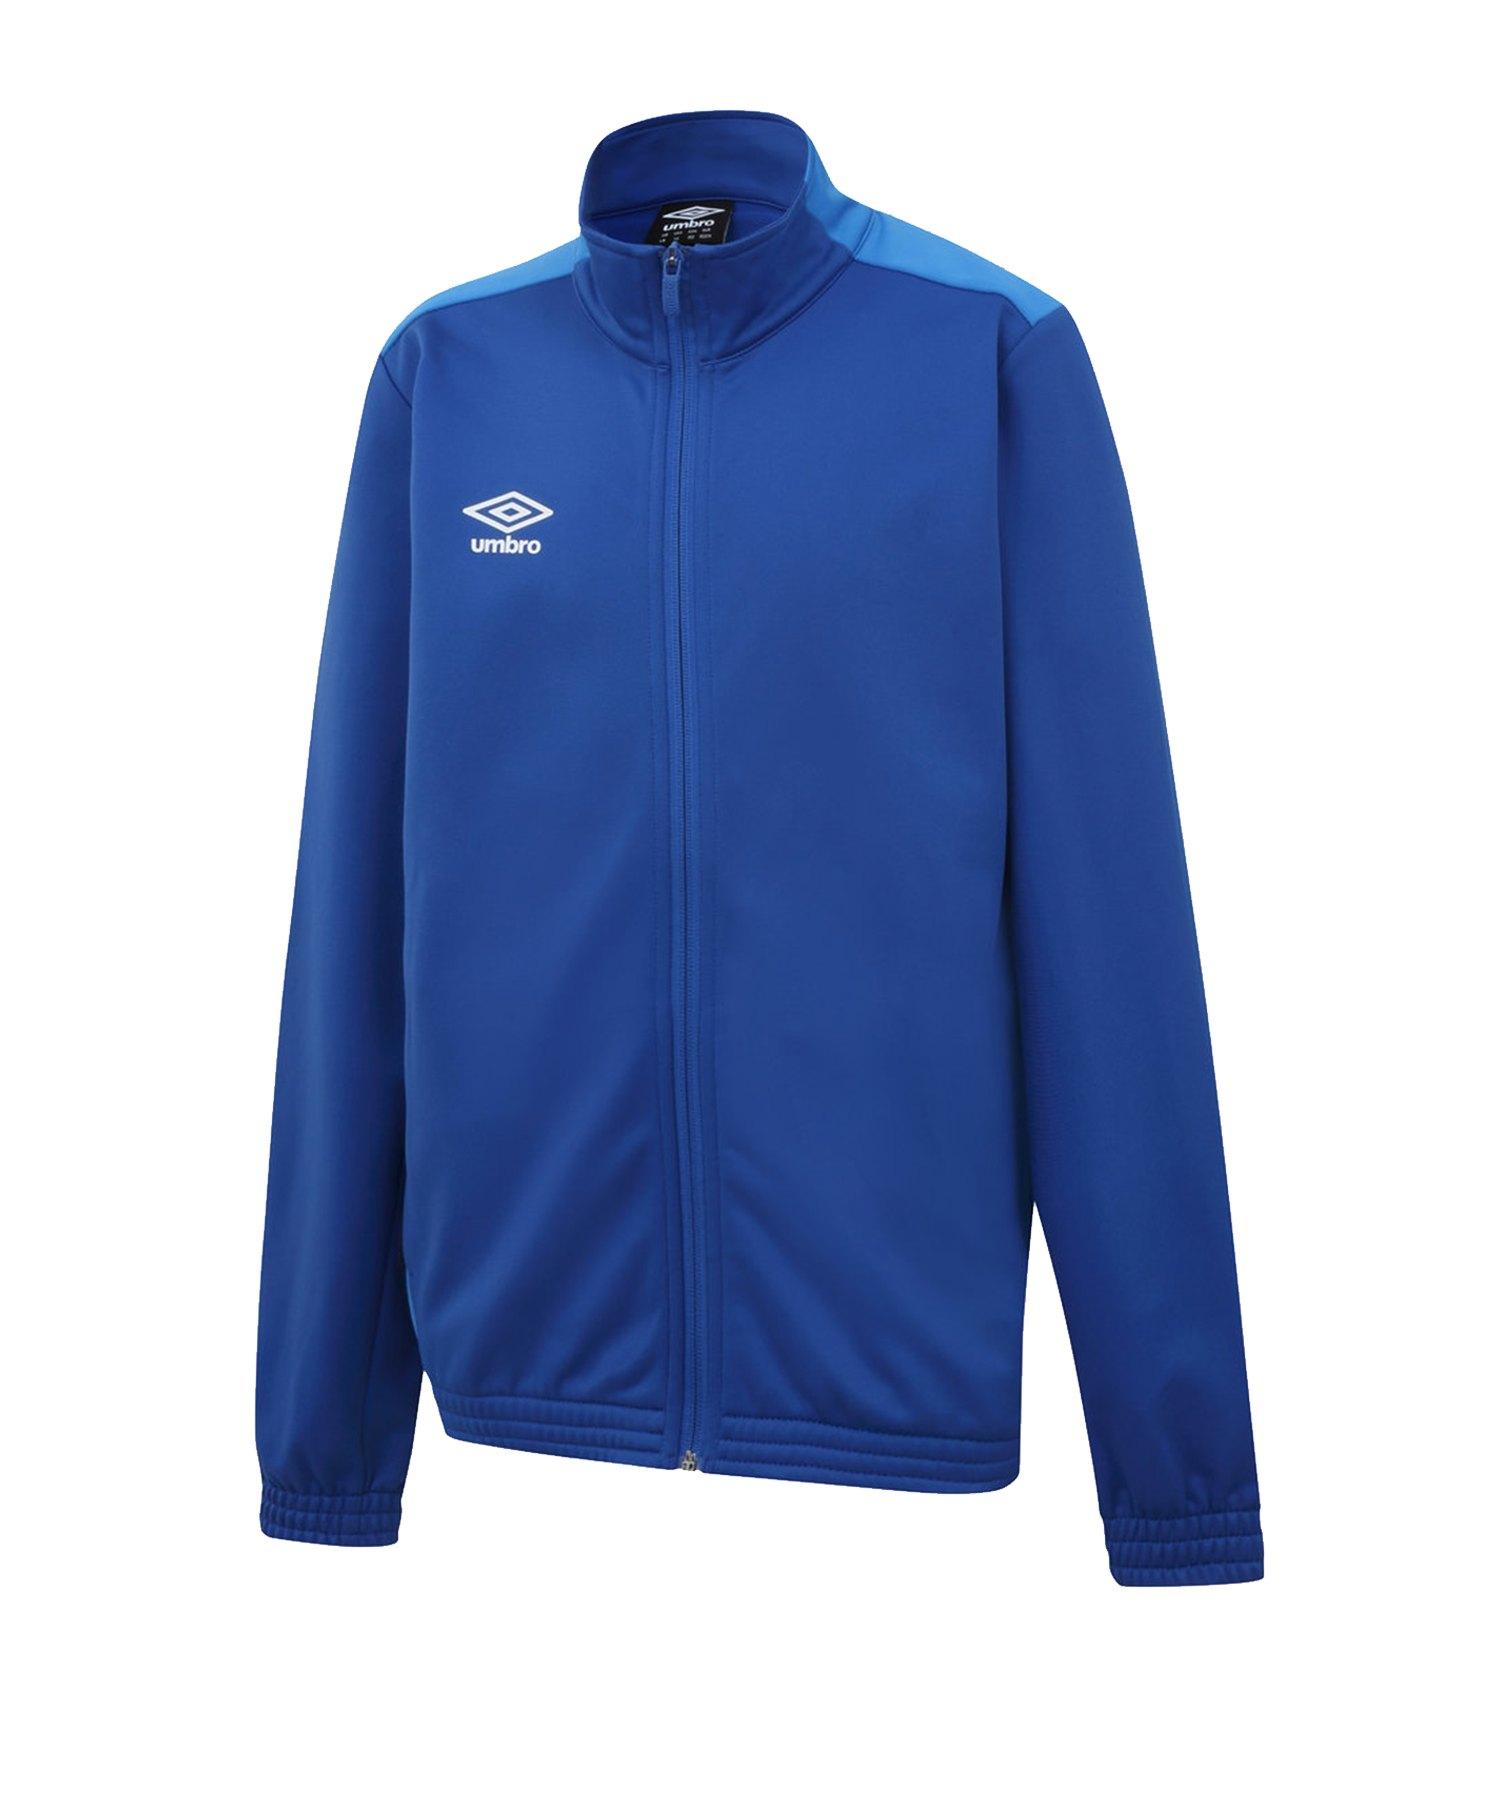 Umbro Training Knitted Jacket Jacke Kids Blau FEVC - blau